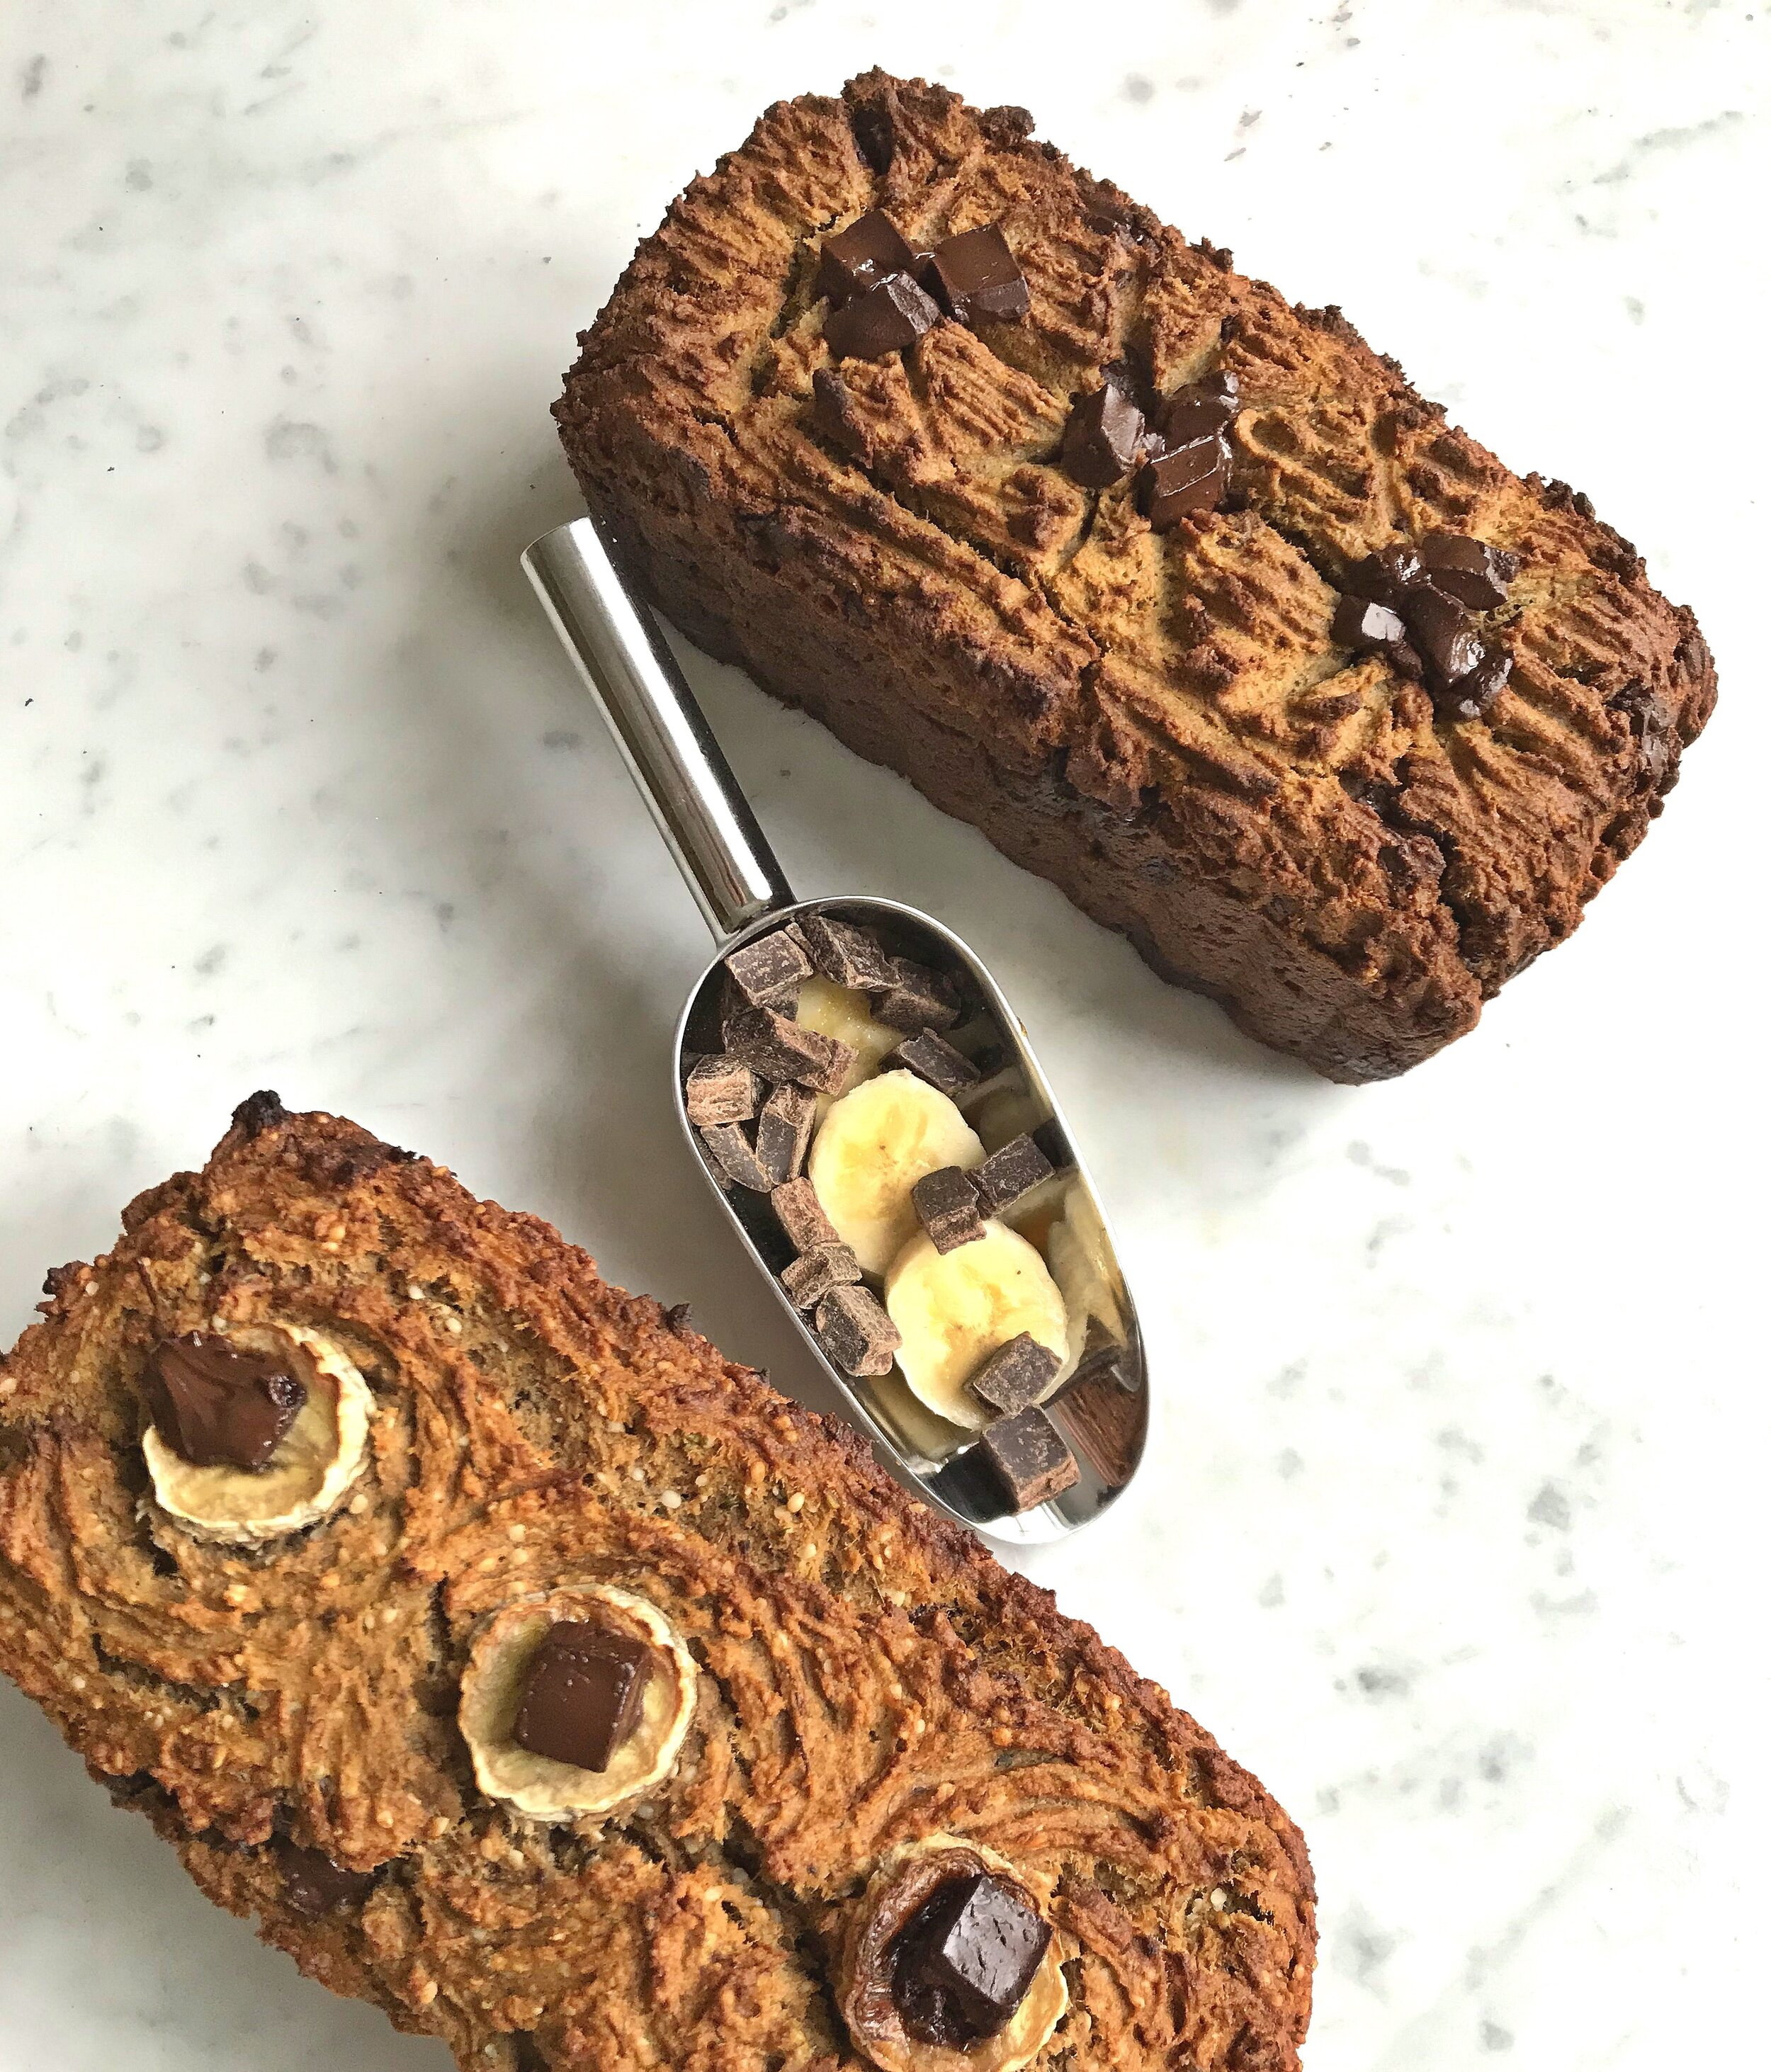 Nut-free Grain-free Chocolate Chunk Banana Bread